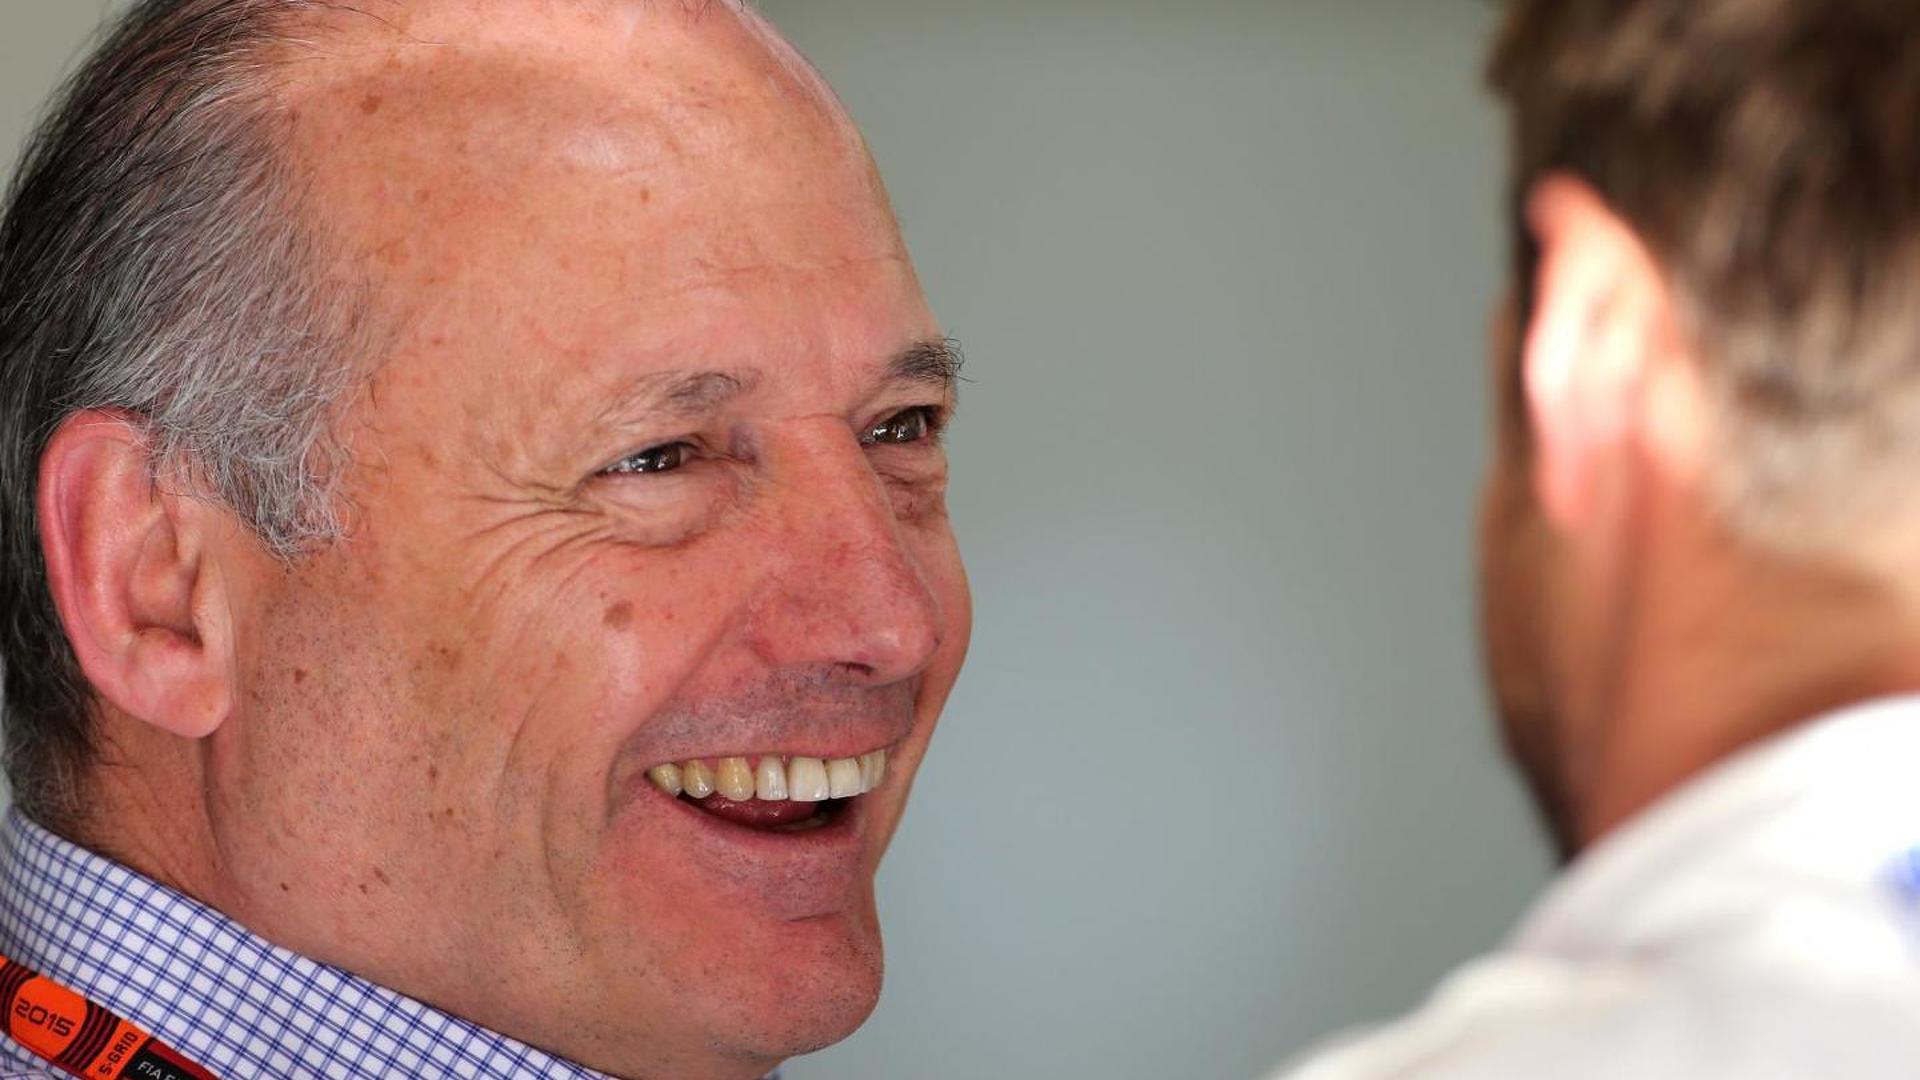 Dennis' Boullier criticism 'humorous' - McLaren